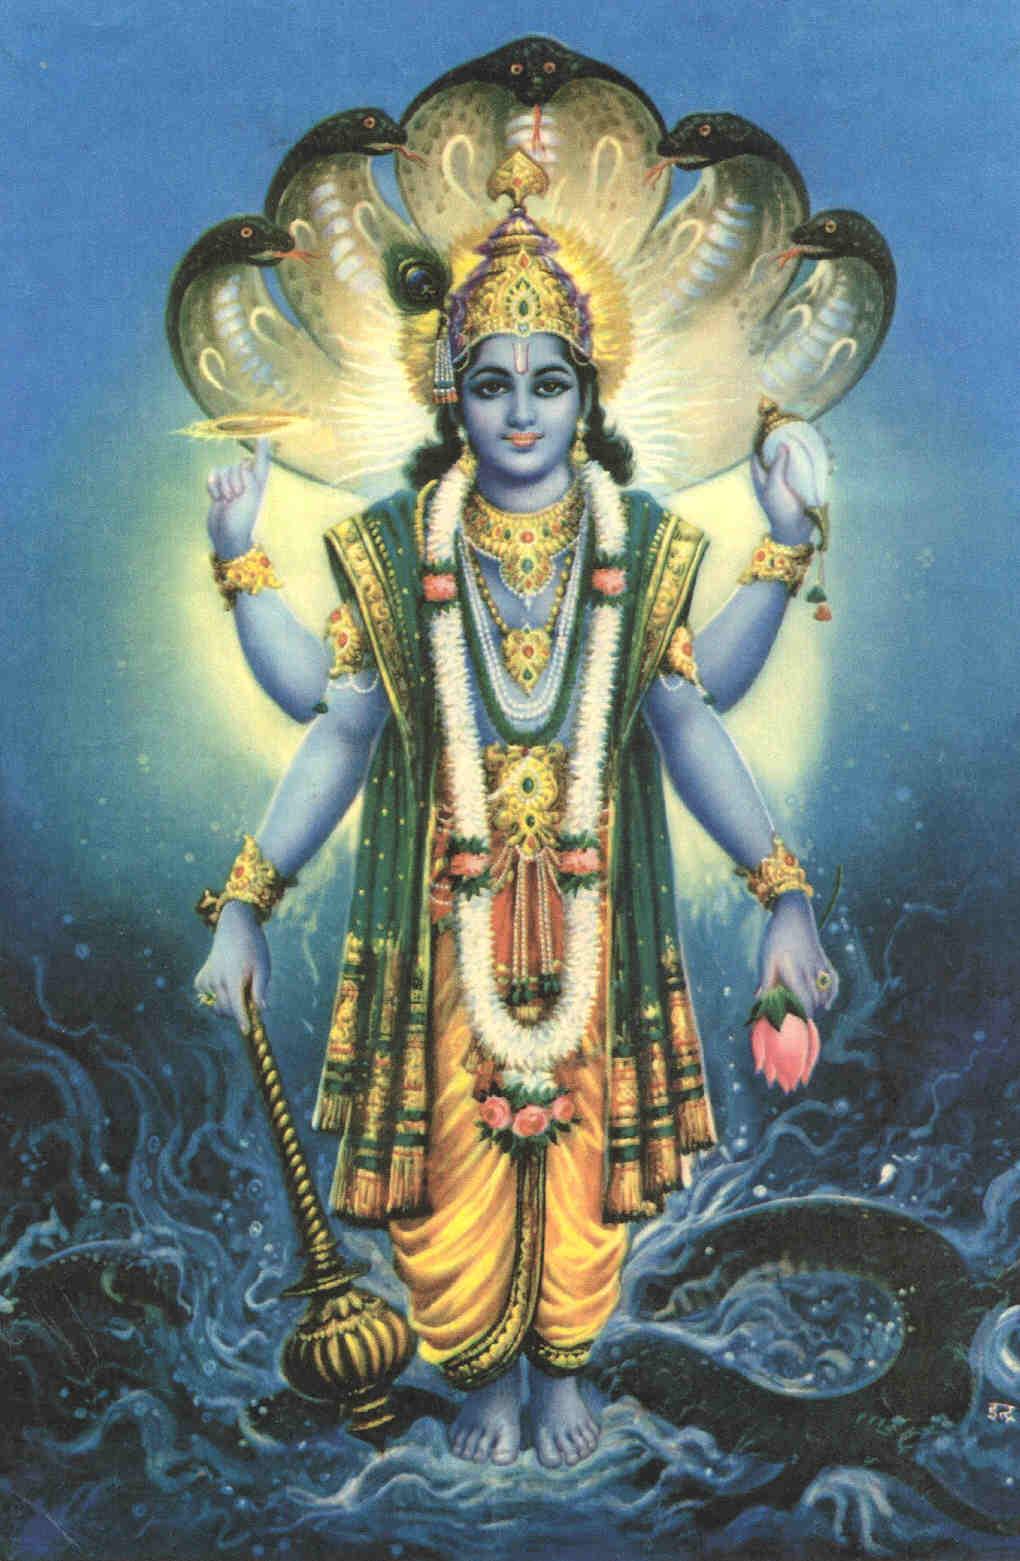 http://4.bp.blogspot.com/_9vPNlqoYUtY/TUJ0bzLTrmI/AAAAAAAADsg/AJ61OevBf-E/s1600/Vishnu+Sahasranamam+Stotram.jpg